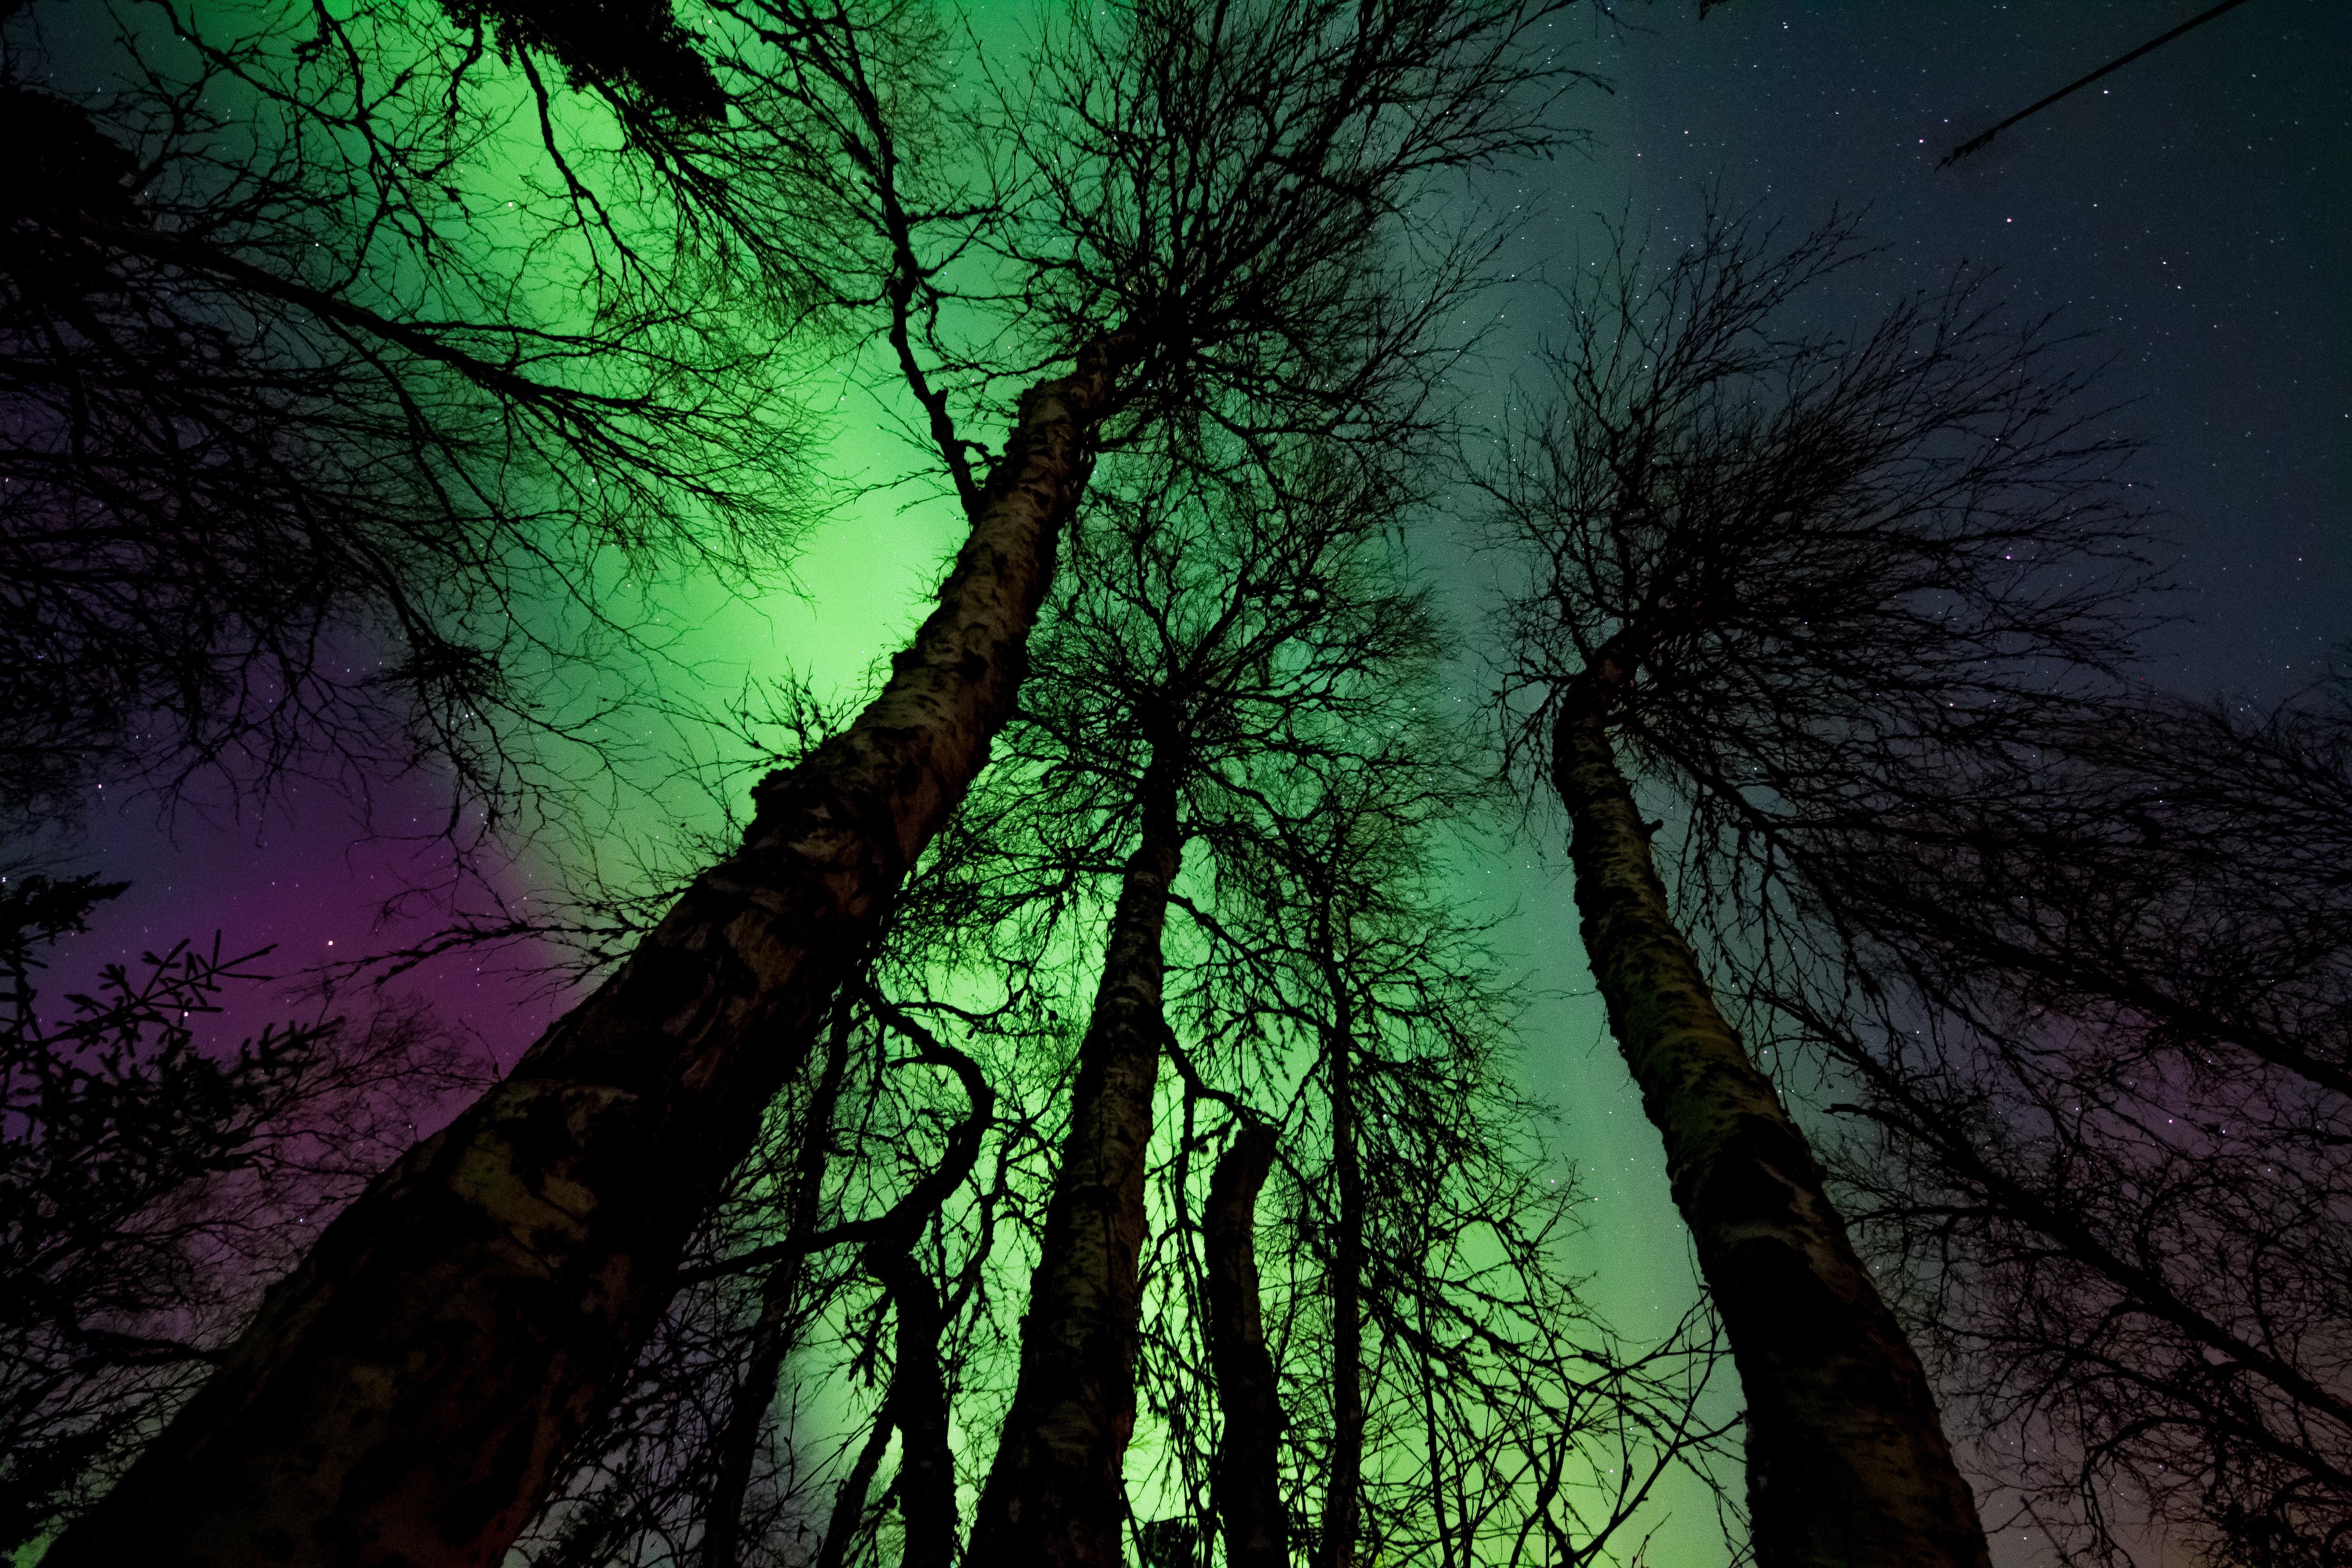 Aurora Borealis, Astronomy, Nightscape, Stars, Starry night, HQ Photo